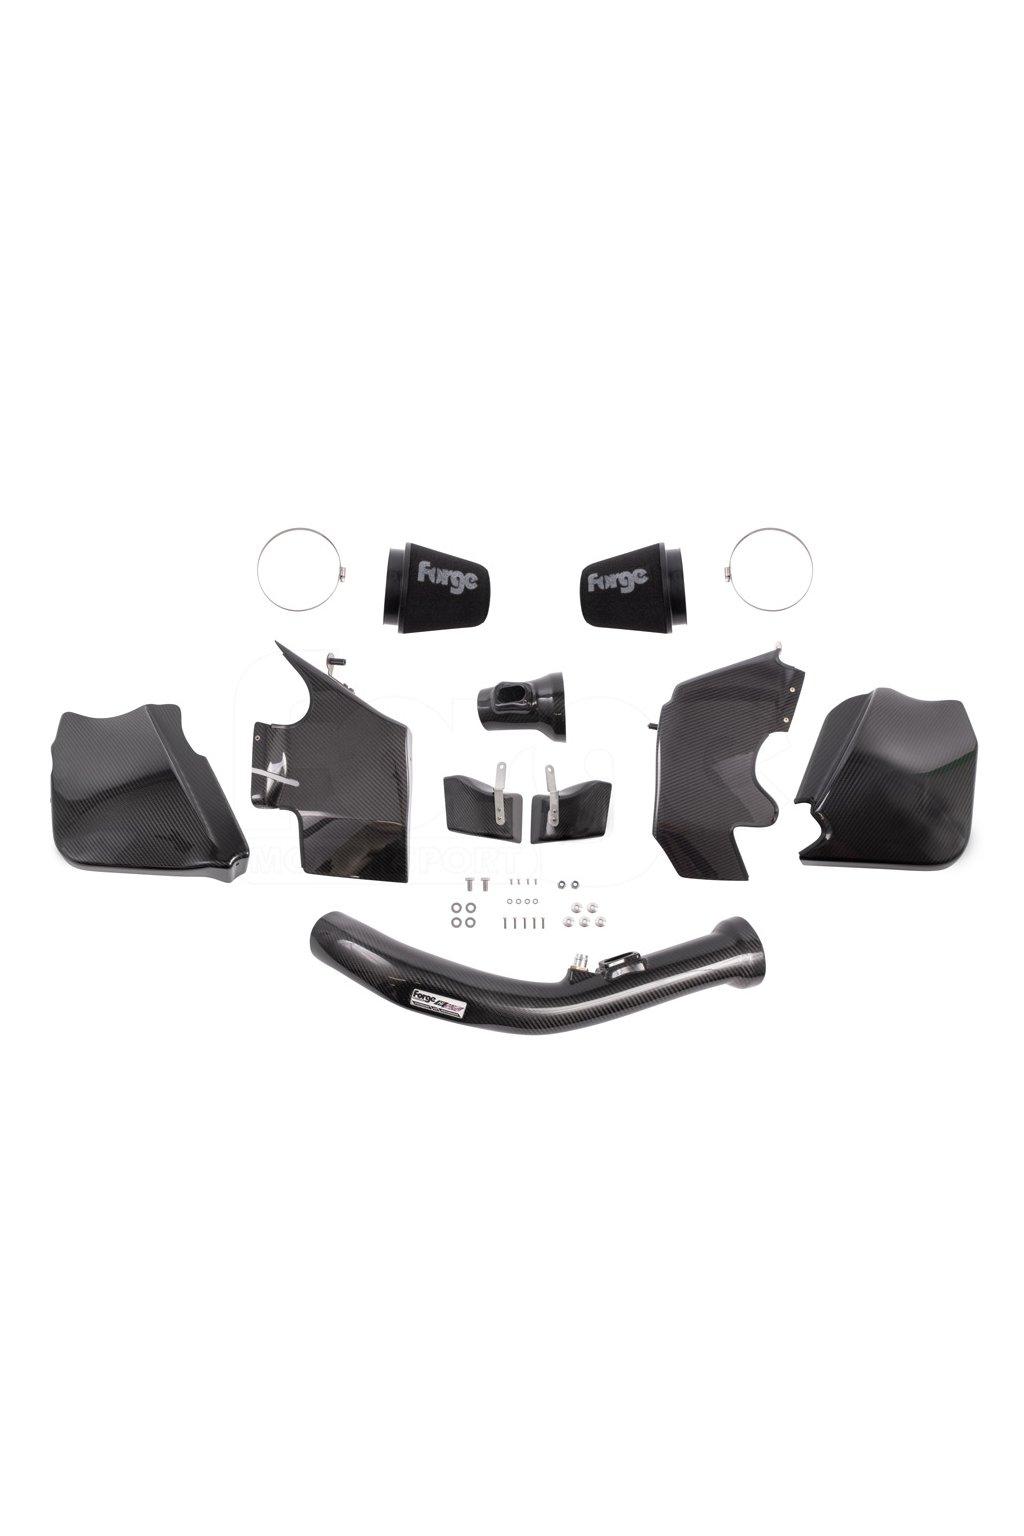 Carbon Fibre Induction Kit for BMW M4 30L Twin Turbo 36961jpeg